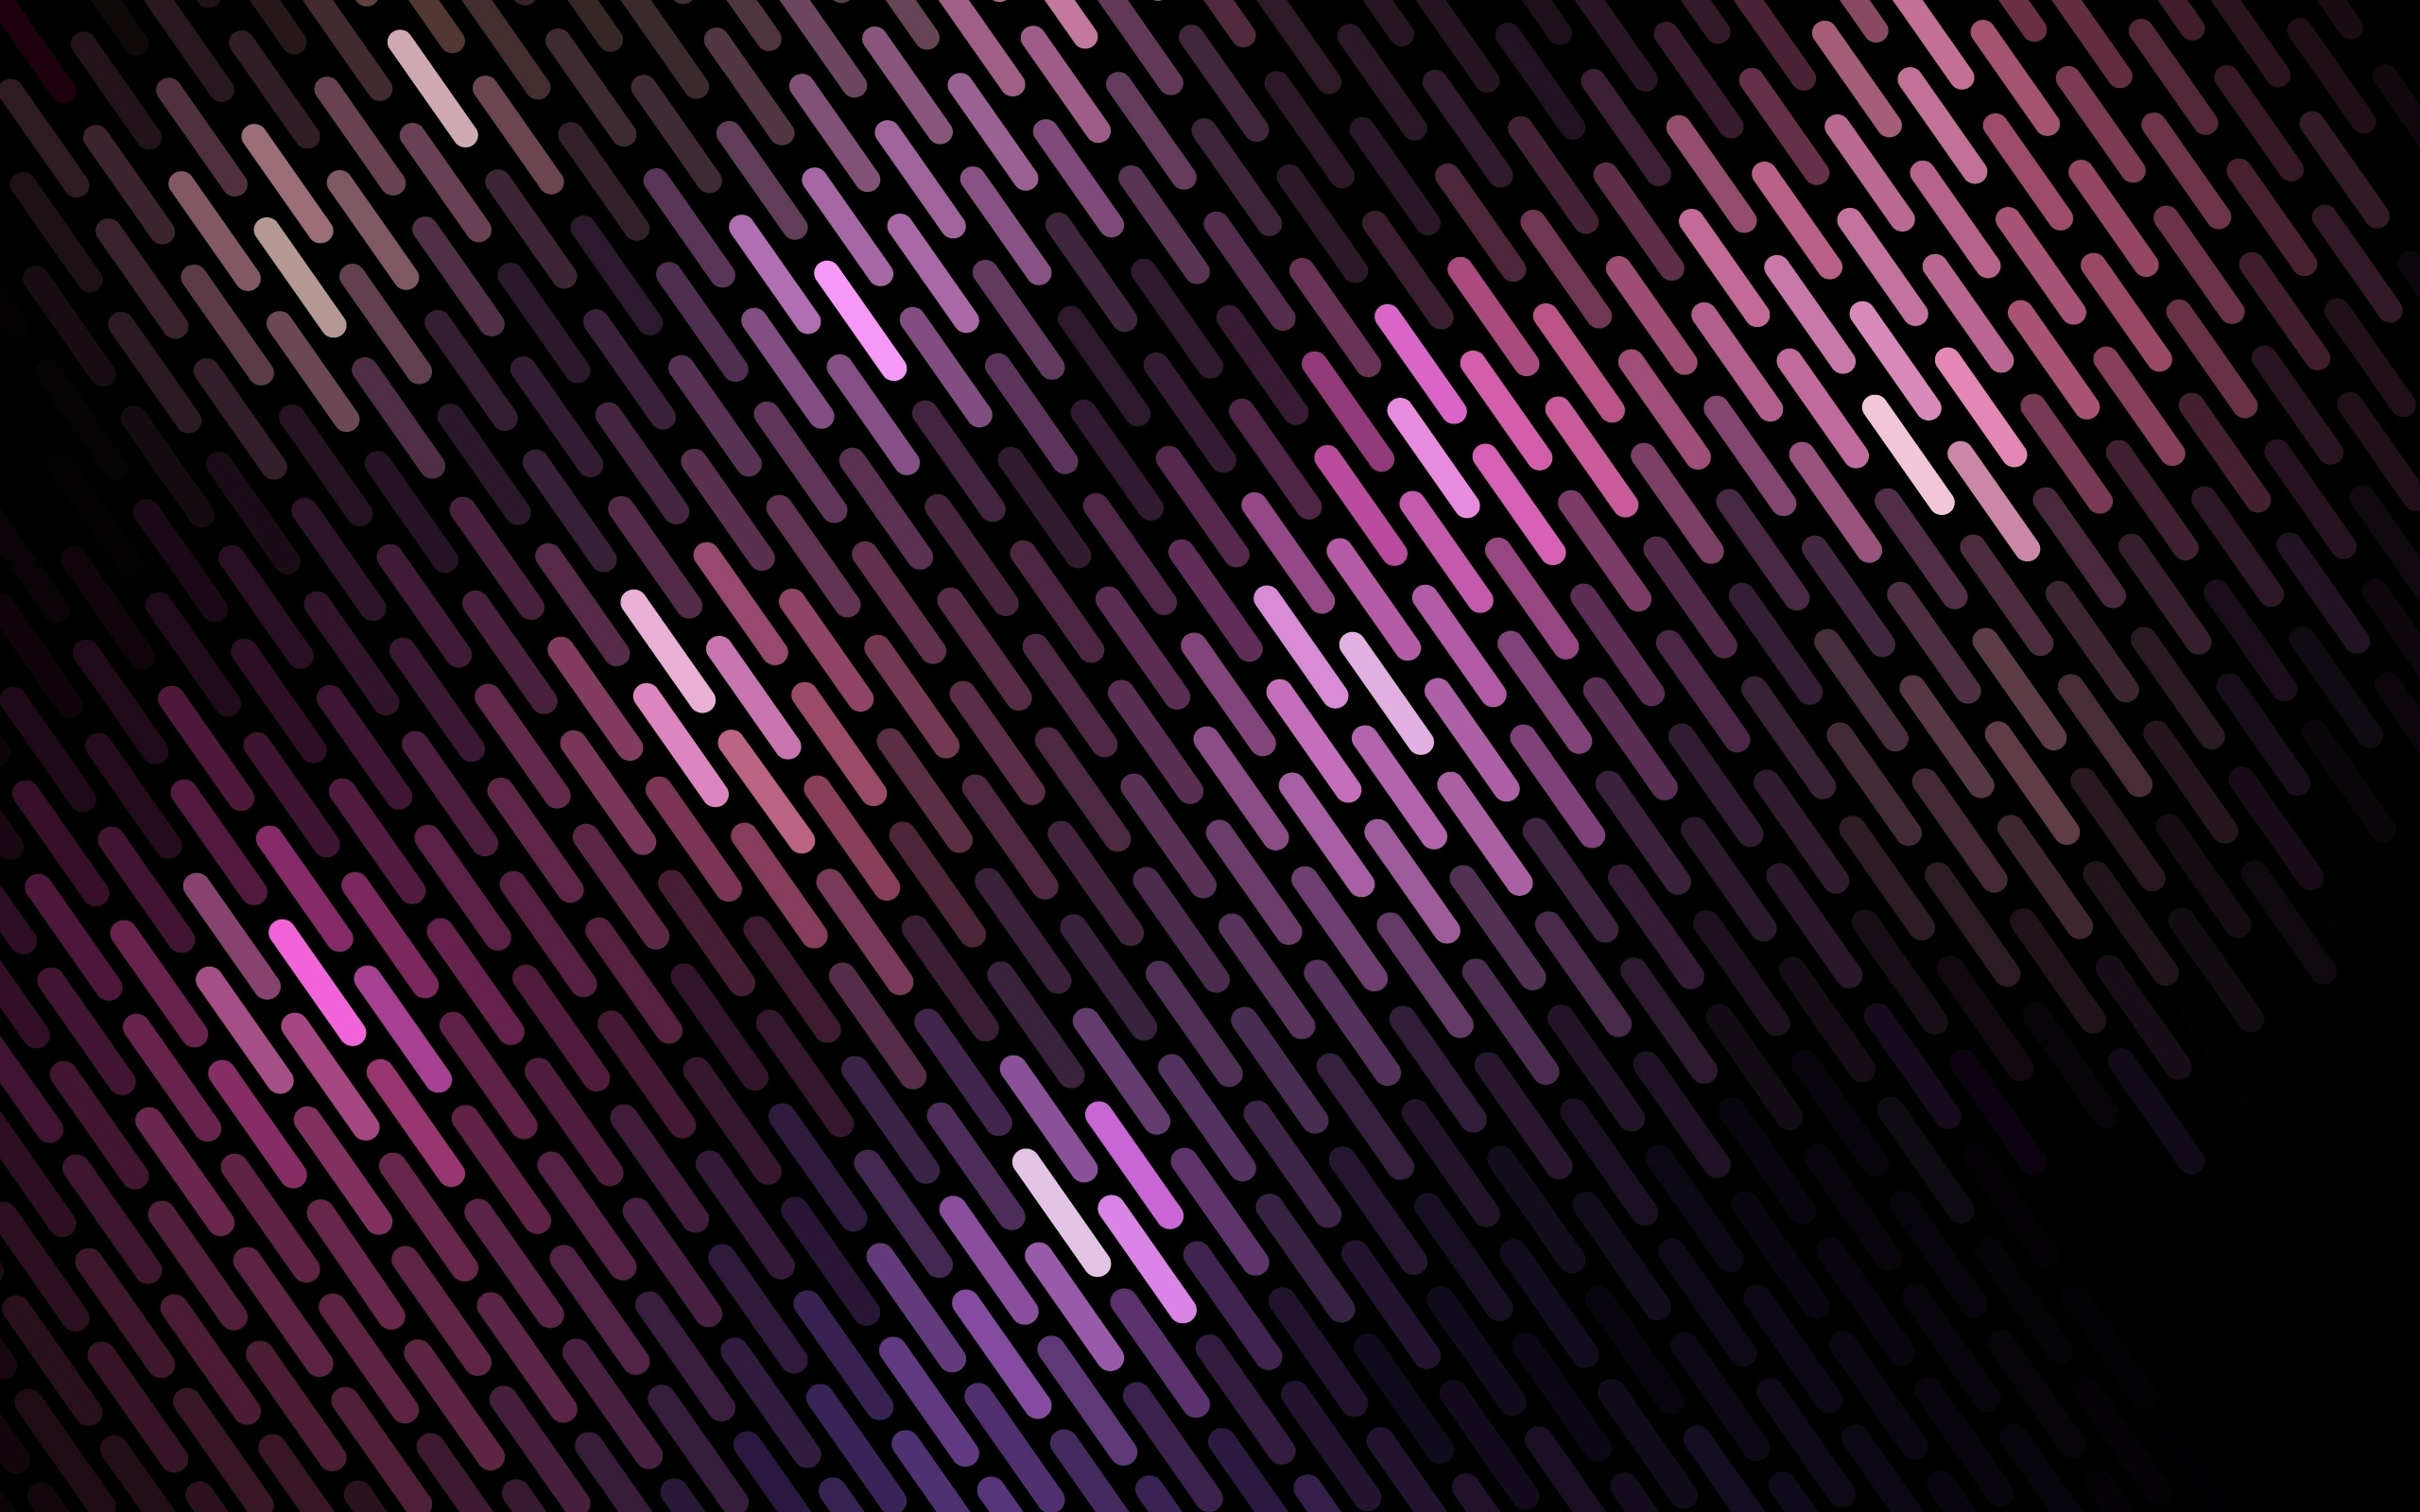 Techno Backgrounds - WallpaperSafari